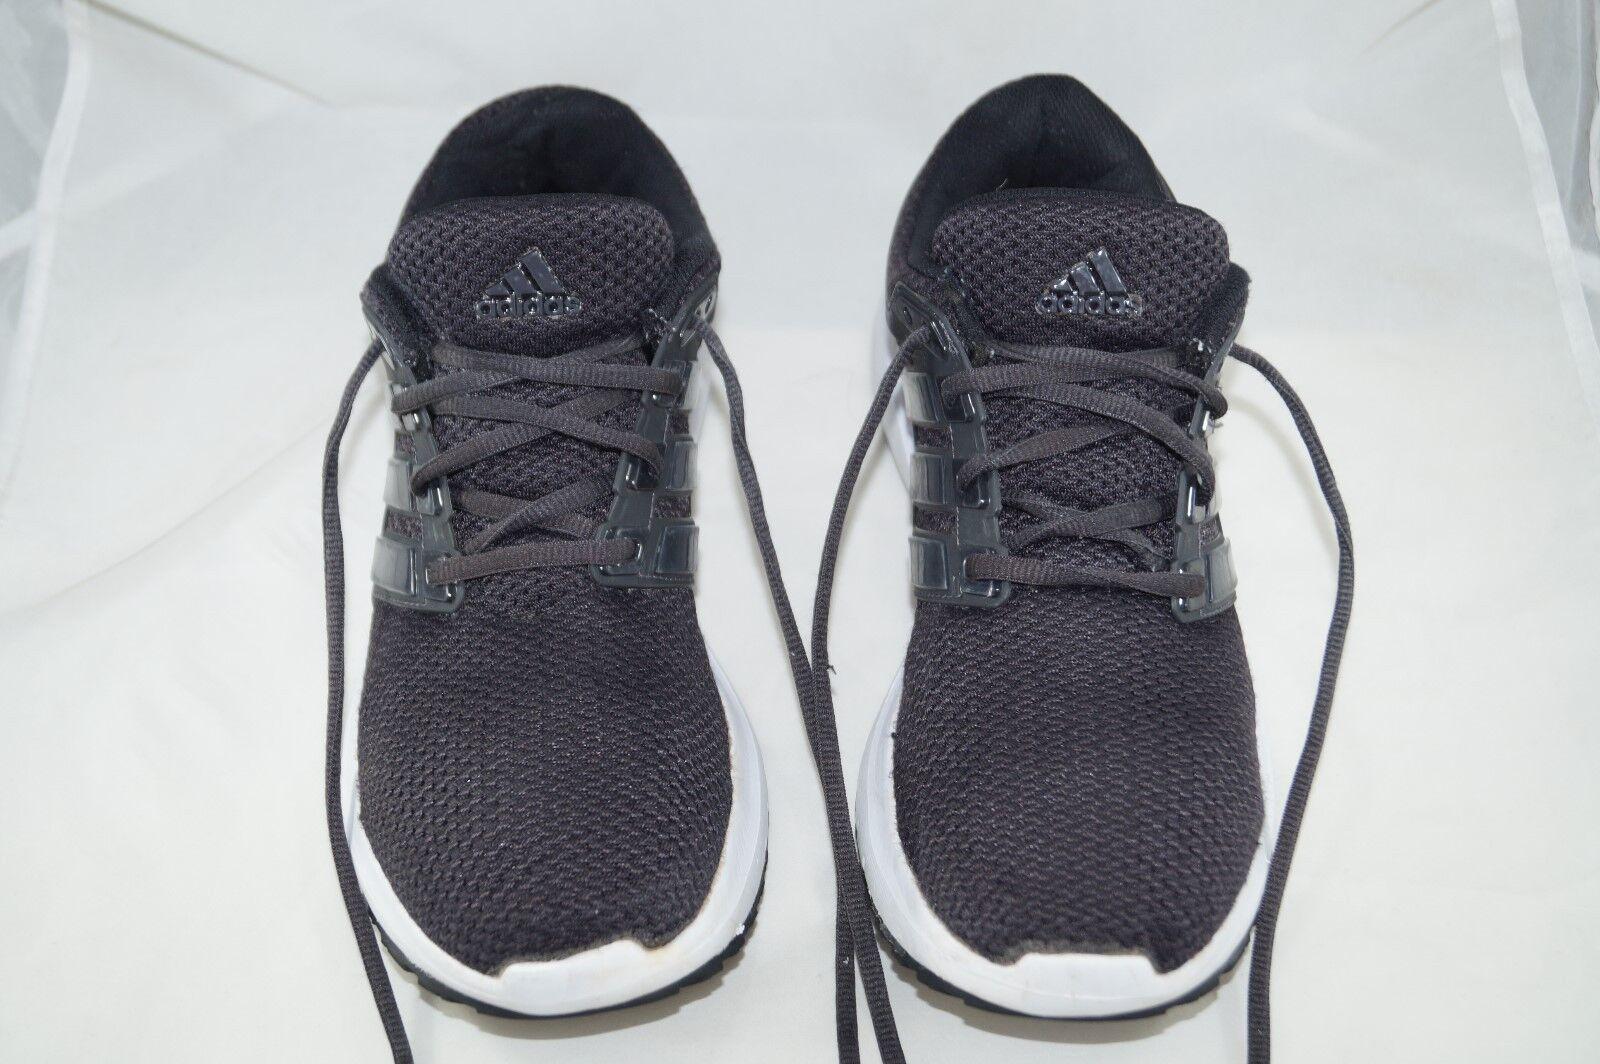 ADIDAS ENERGY CLOUD WTC M BA7520 Sneaker Herren Herrenschuhe Turnschuhe